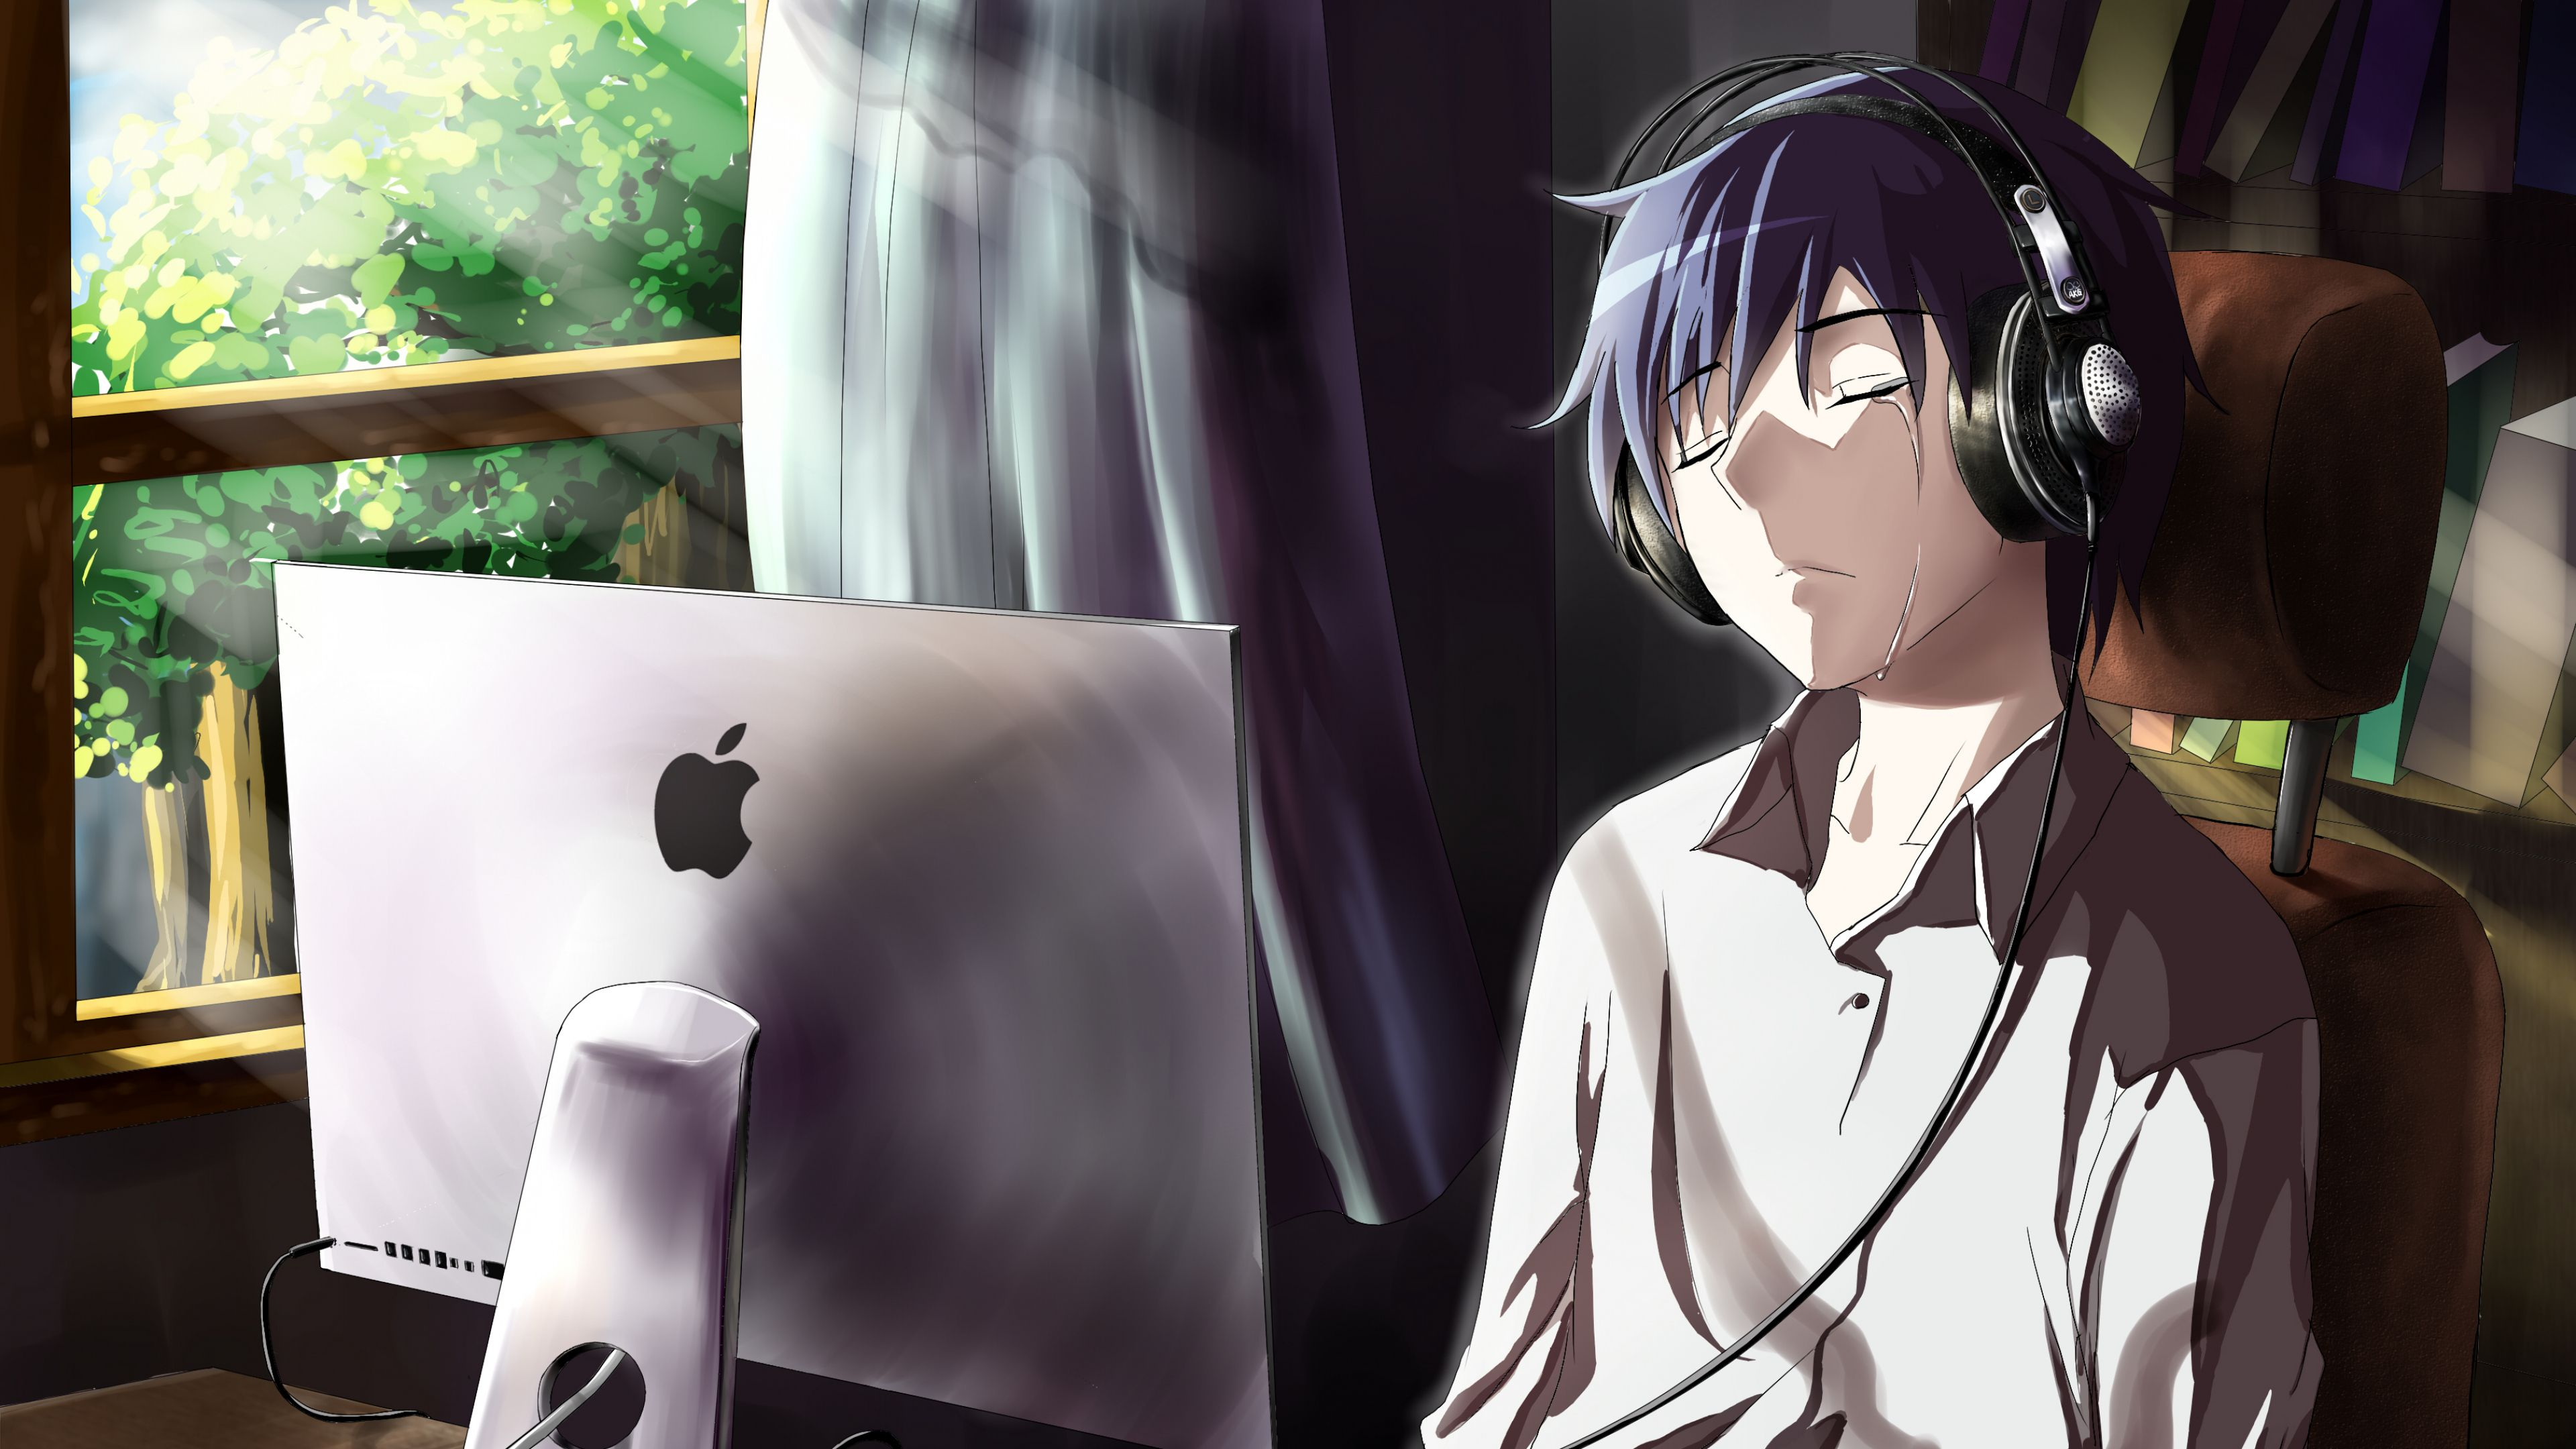 Wallpaper estilo anime (Dengan gambar) Gambar anime